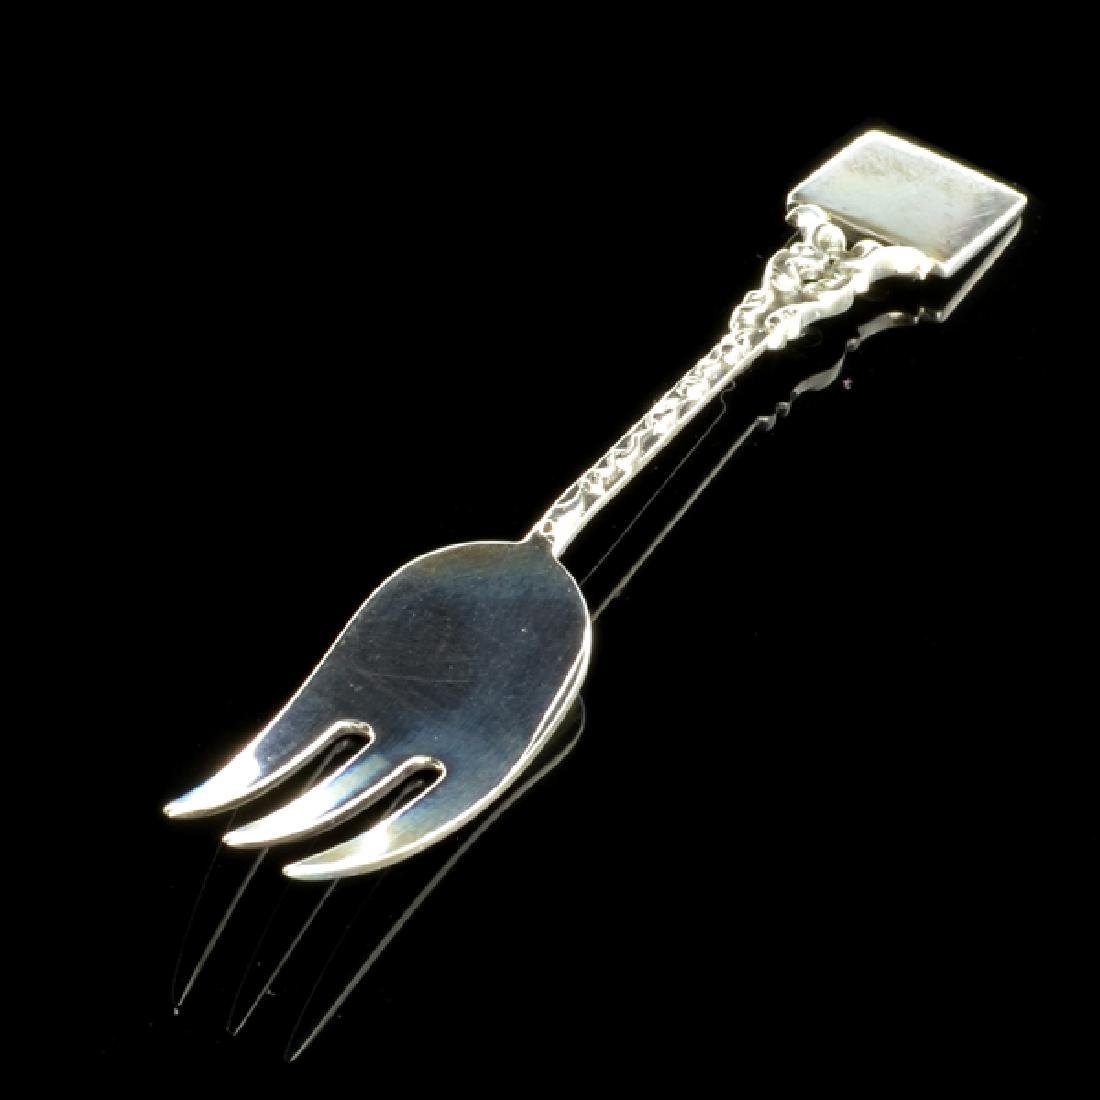 Fine Jewelry Sterling Silver Baby Fork